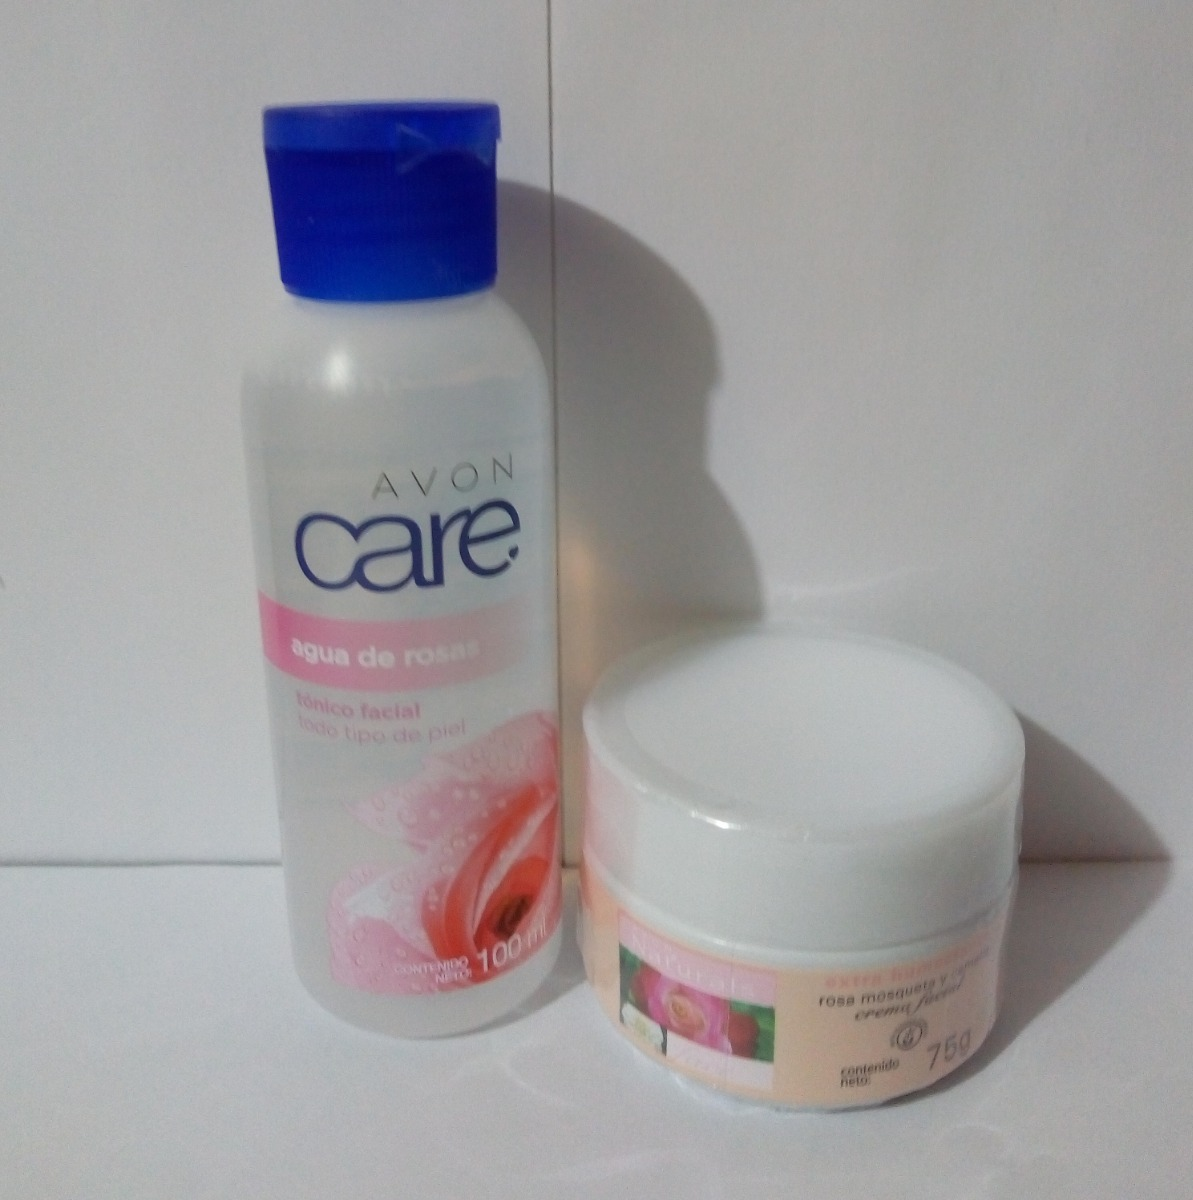 863737aec Set X 2 Crema Rosa Mosqueta Y Agua De Rosas Avon - $ 18.000 en Mercado Libre